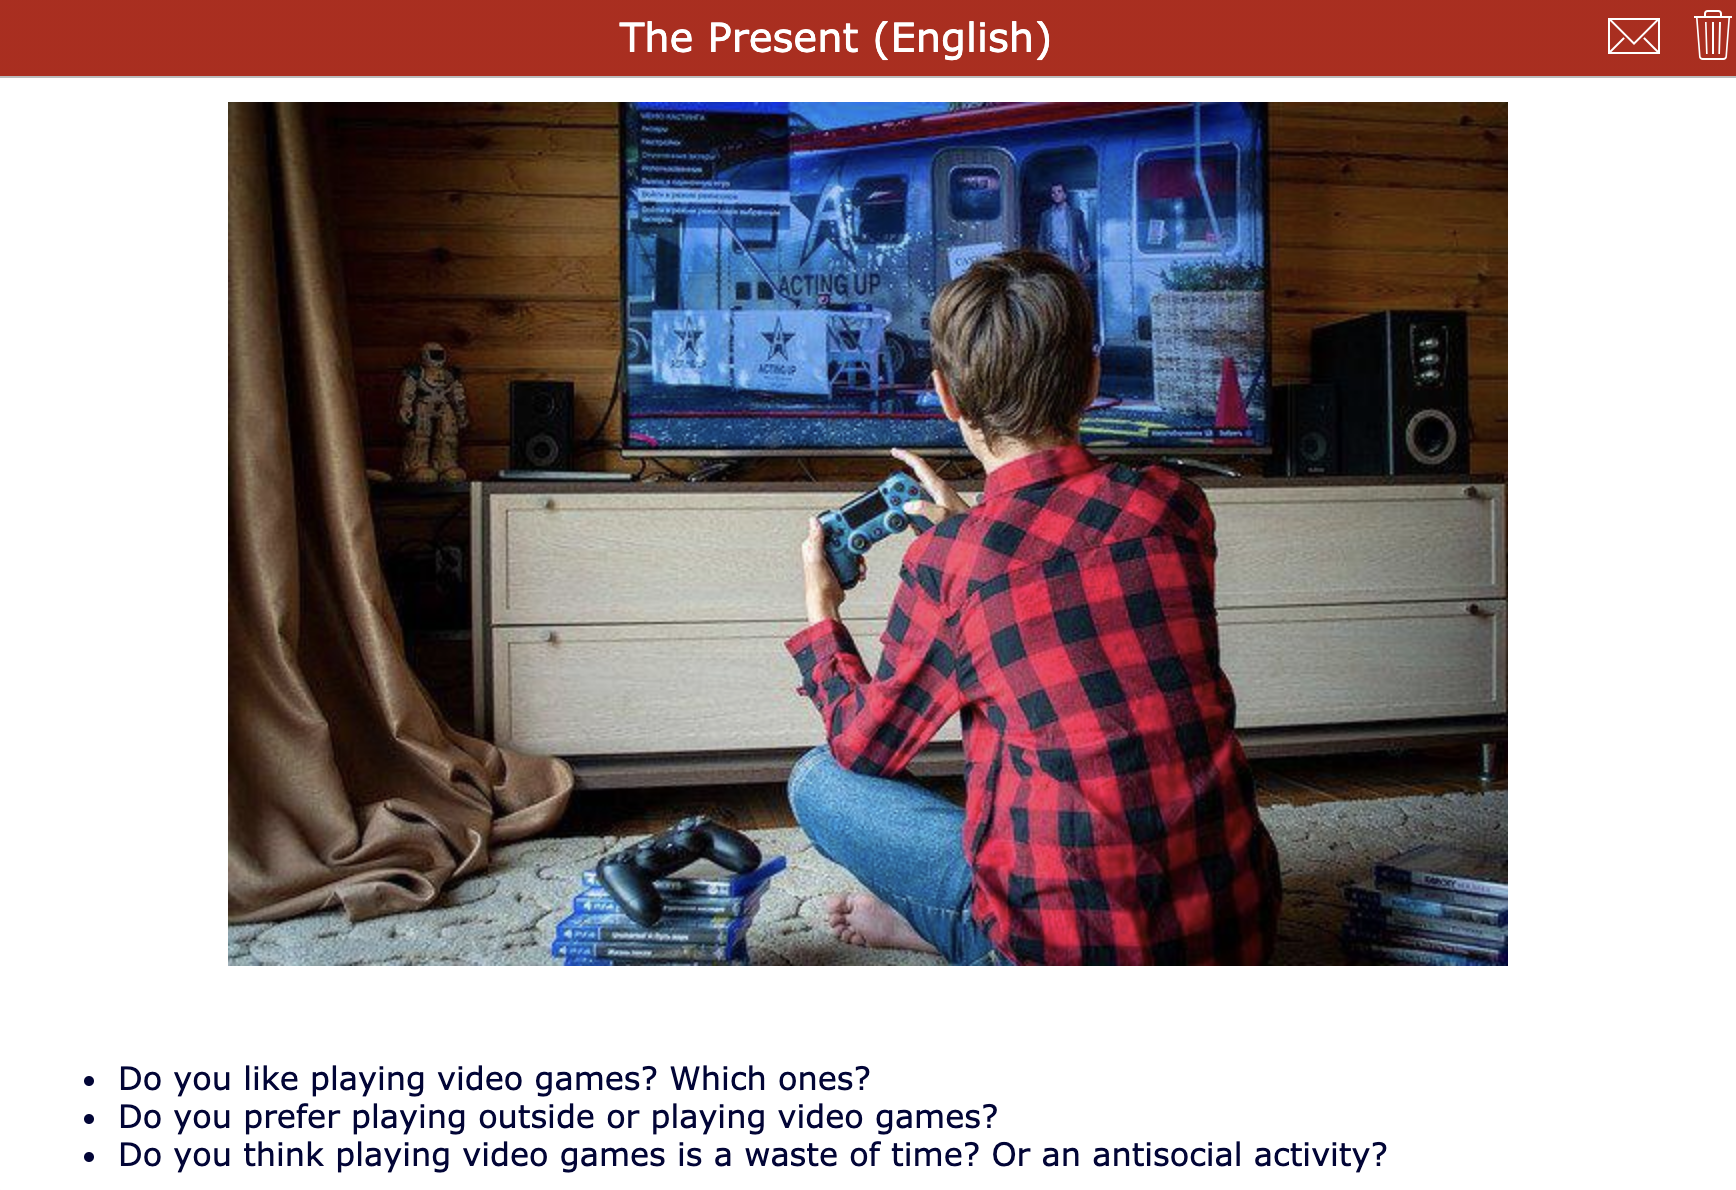 short films - The present - english listening comprehension activity